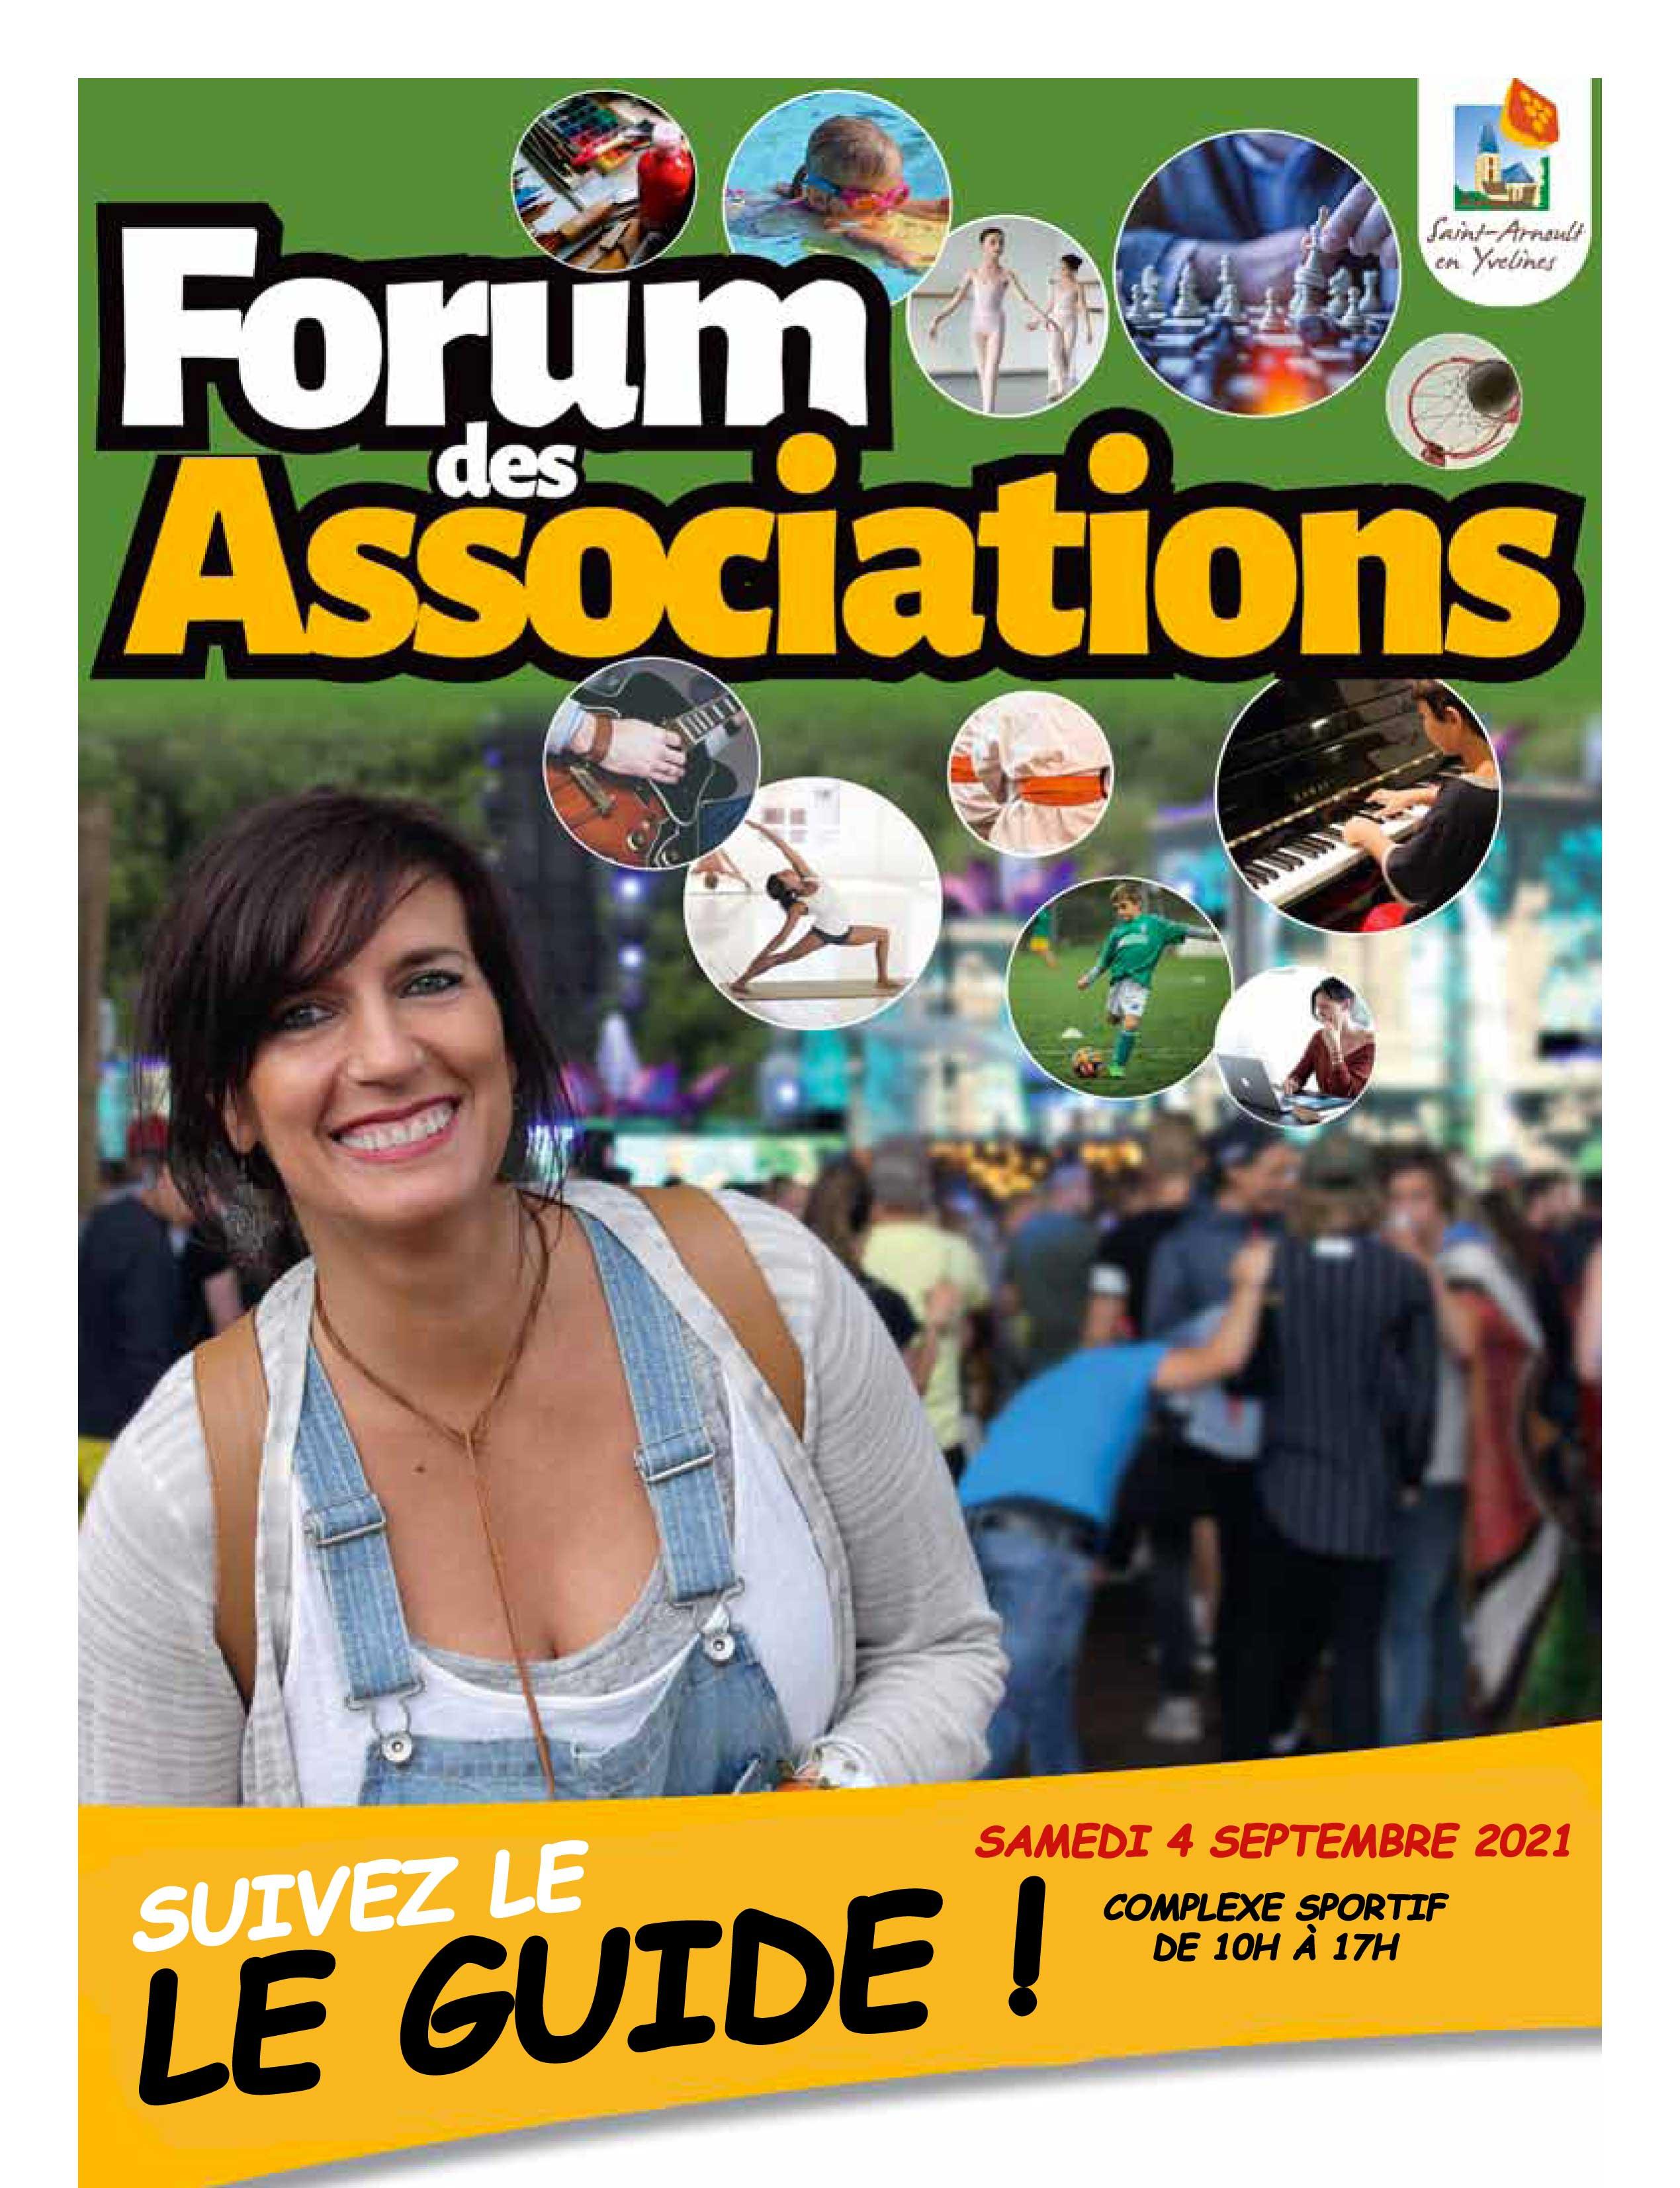 Guide-des-associations-1.jpg